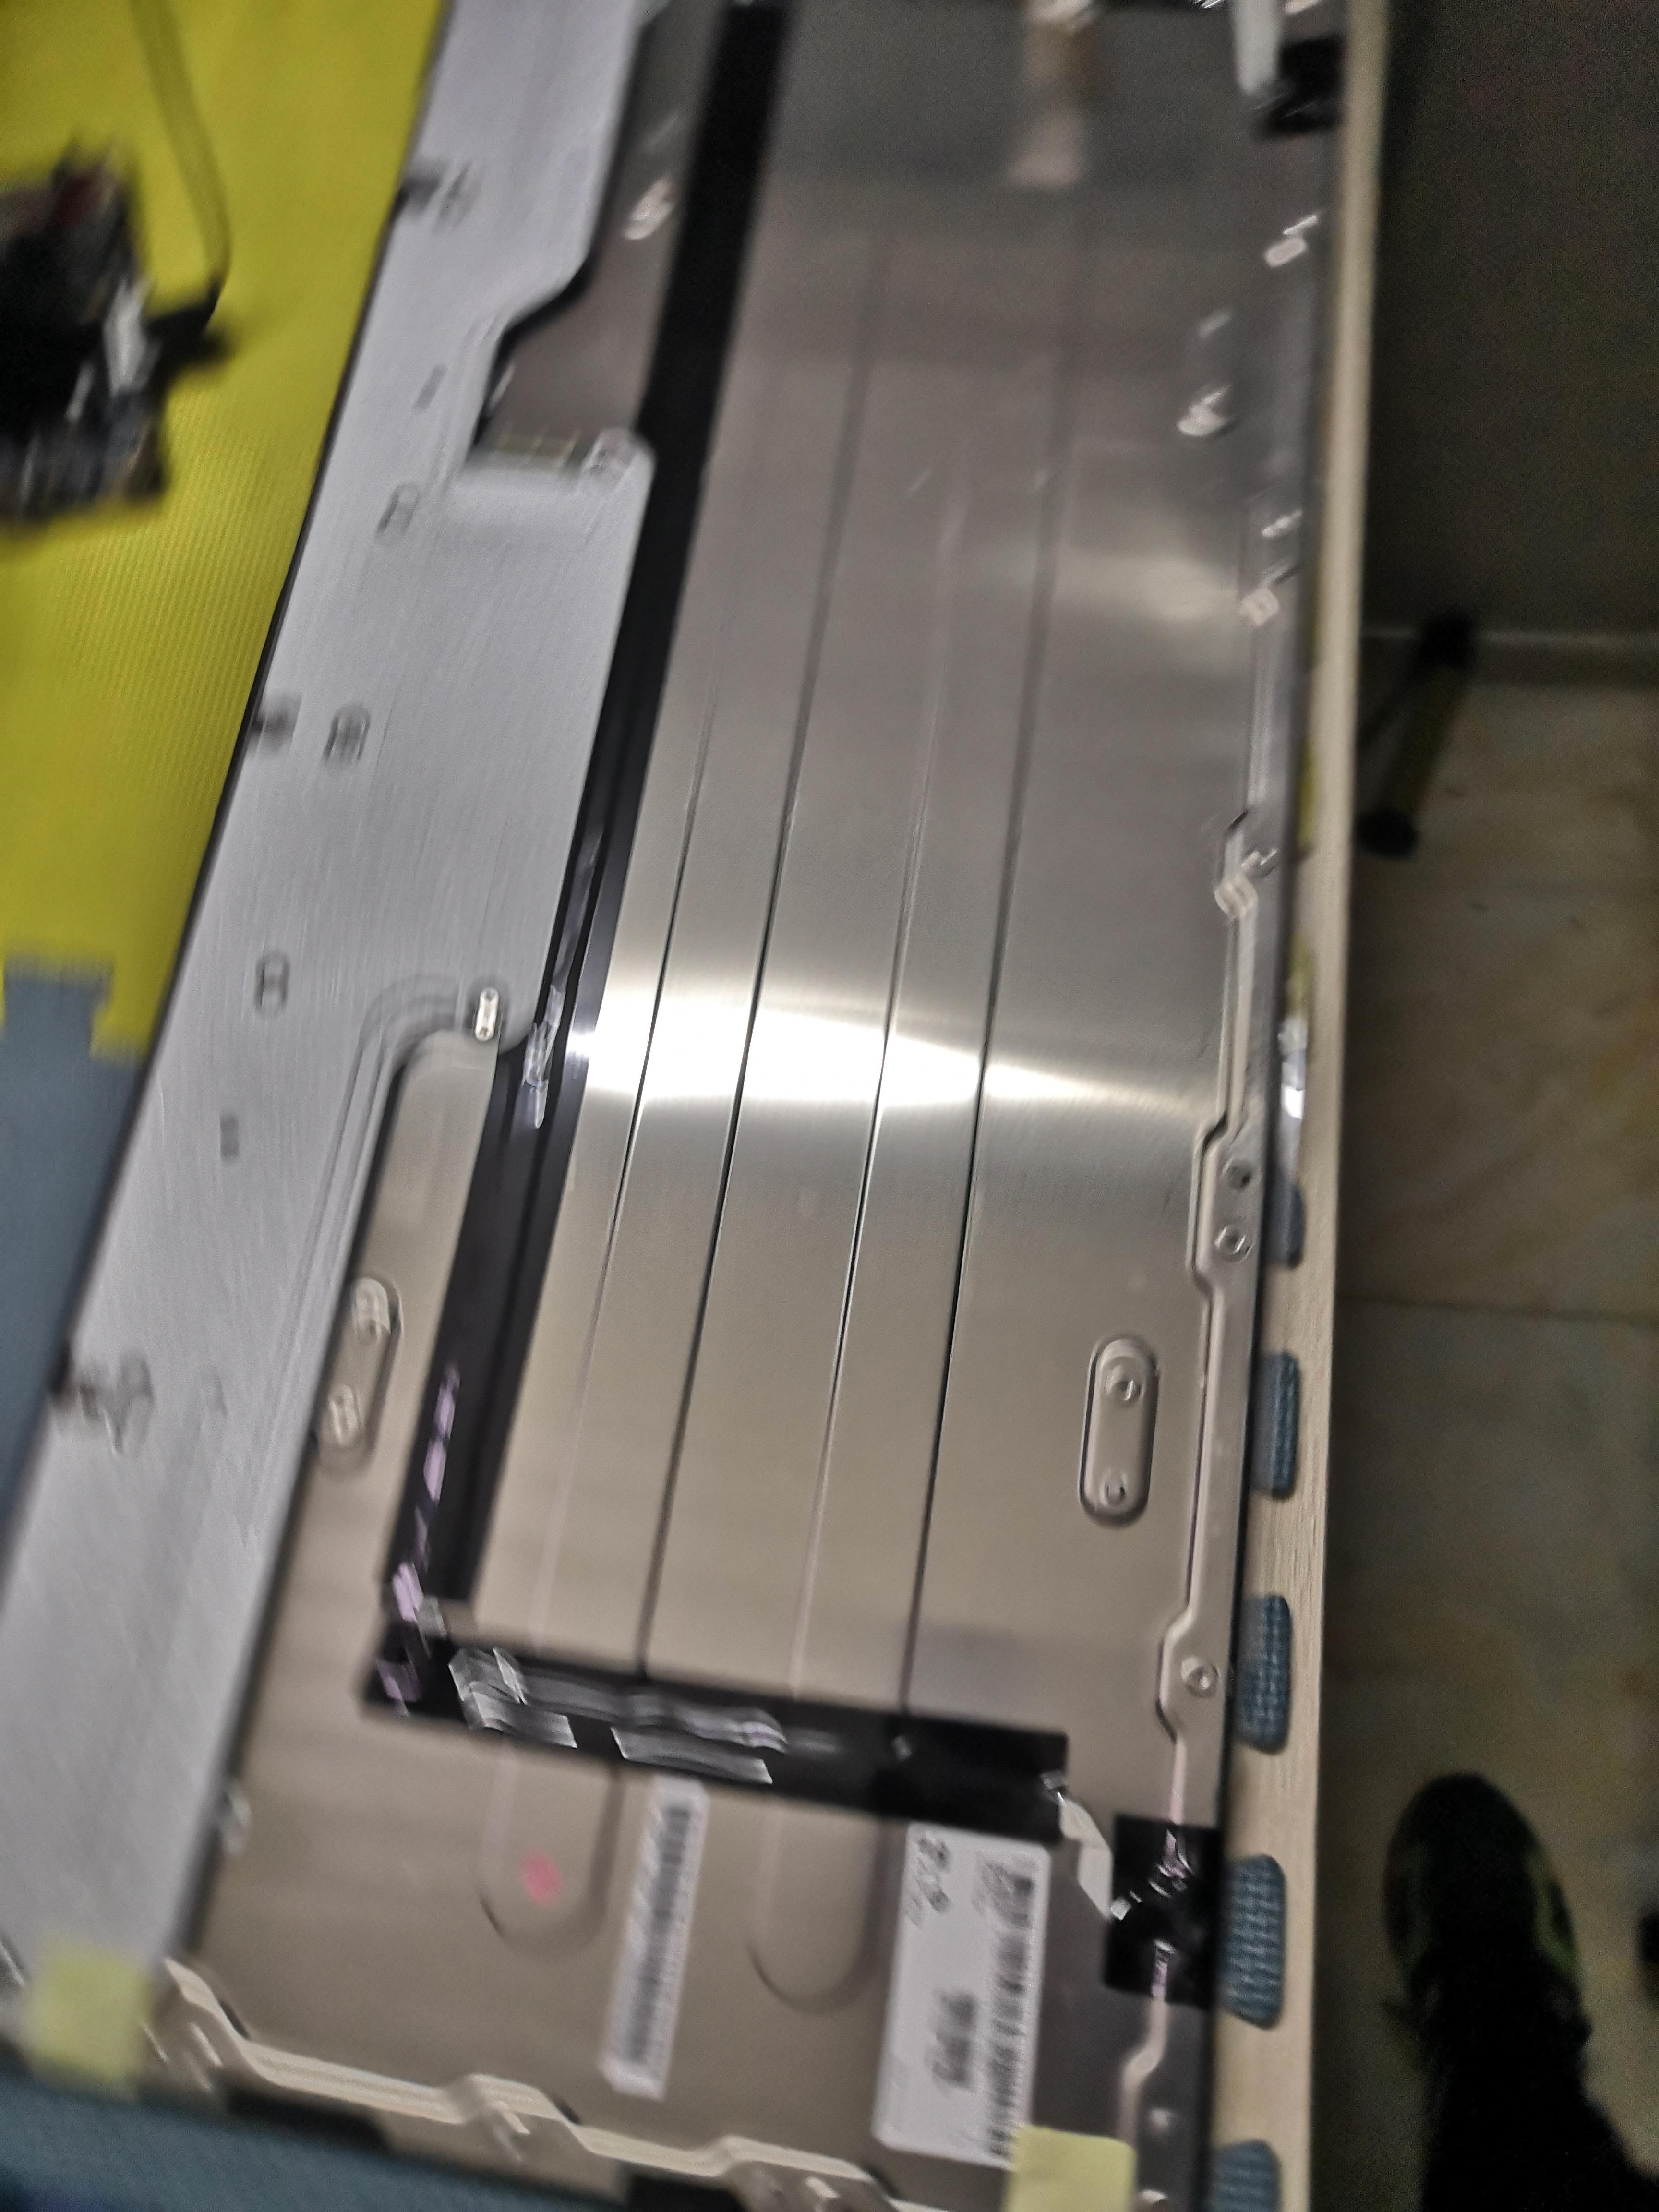 Novo original lm340rw1 ssa1 ss a1 34-inch 5k hd quatro-face estreita moldura 10bit ips tela lcd para 34wk95u display